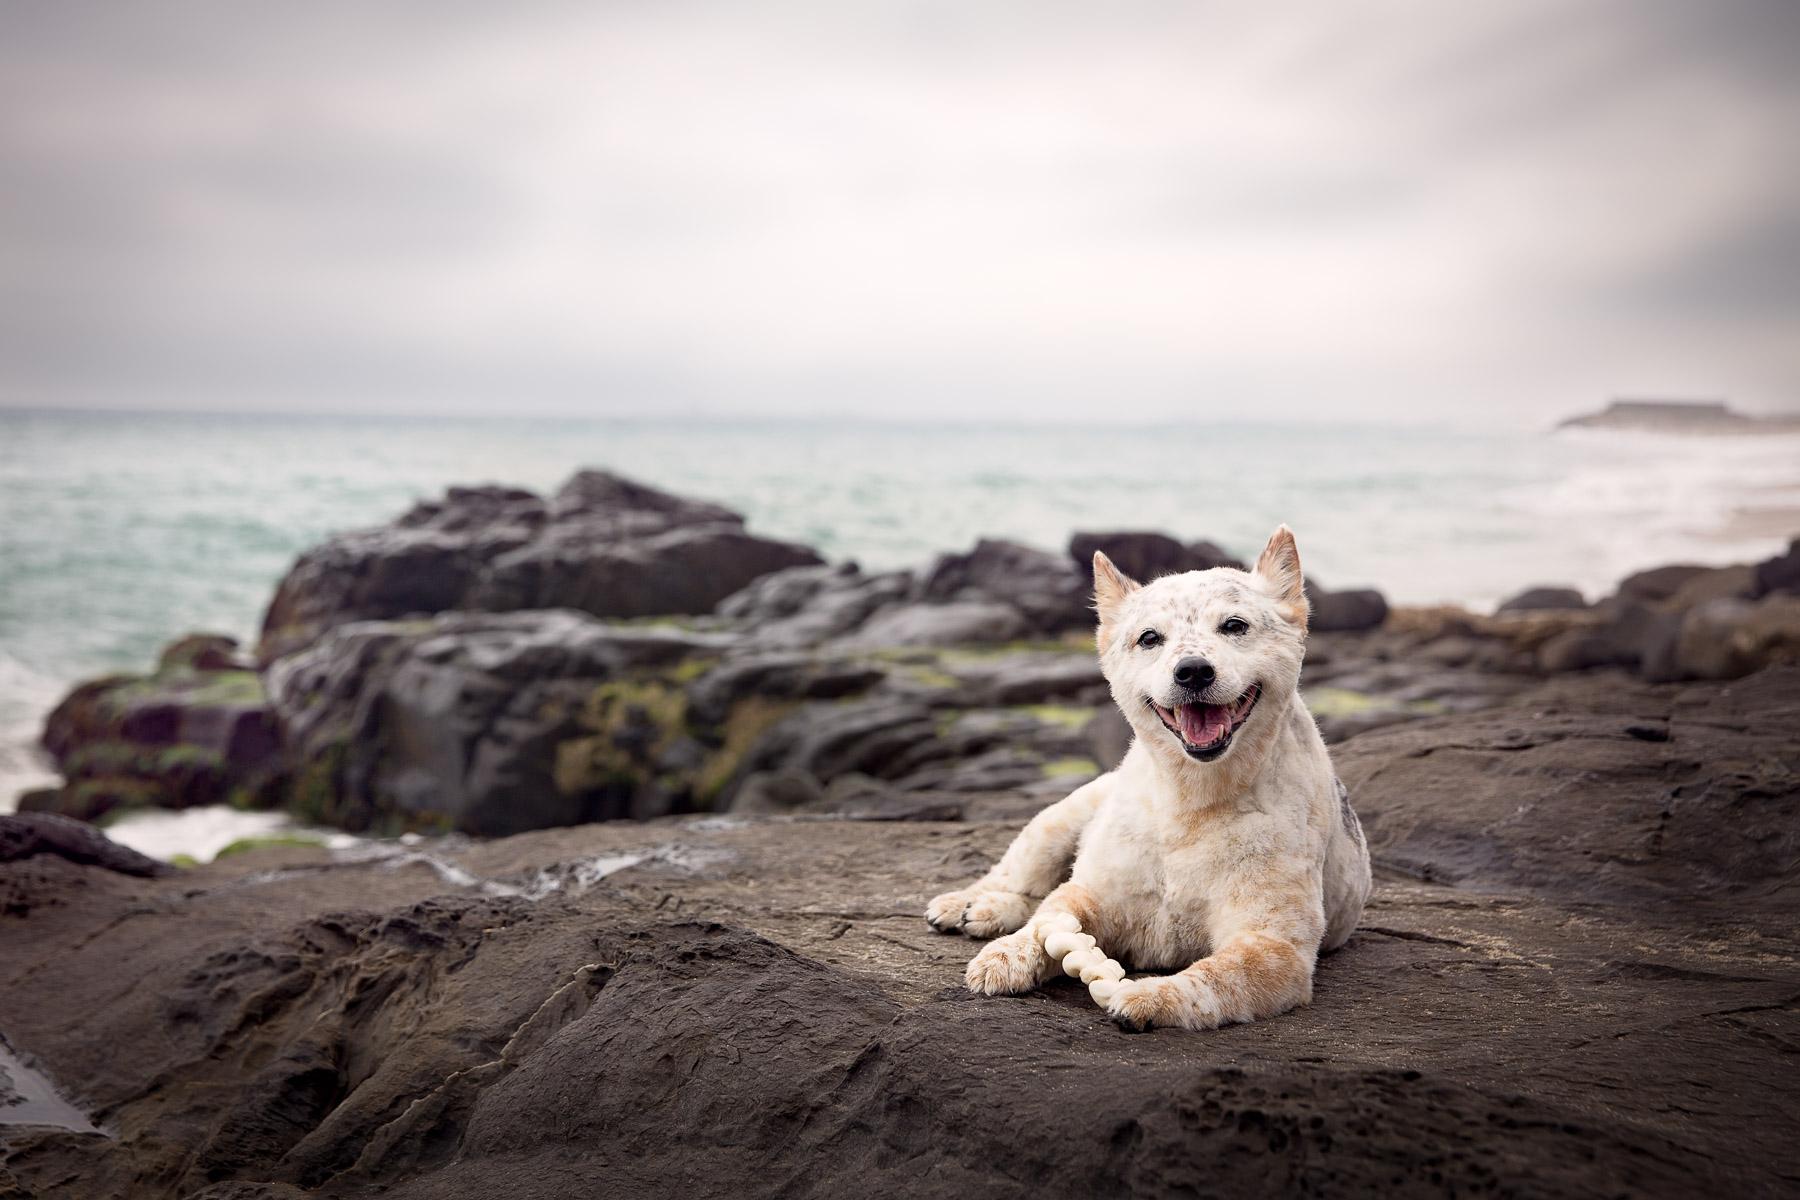 los-angeles-commercial-dog-photographer-for-pet-brands-26.jpg